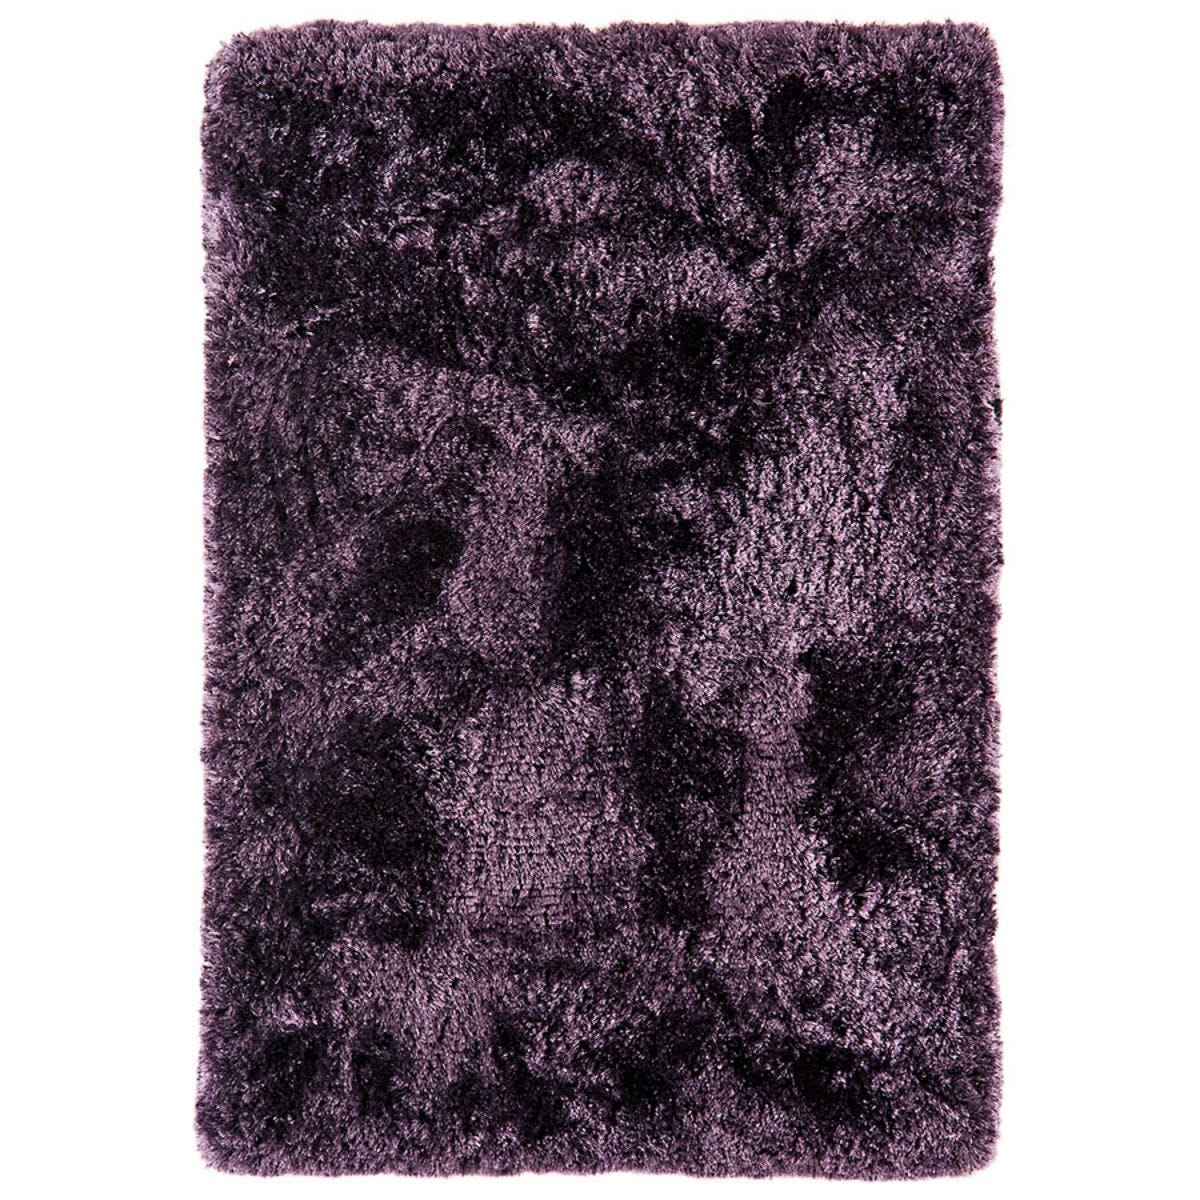 Asiatic Plush Shaggy Rug, 70 x 140cm - Purple